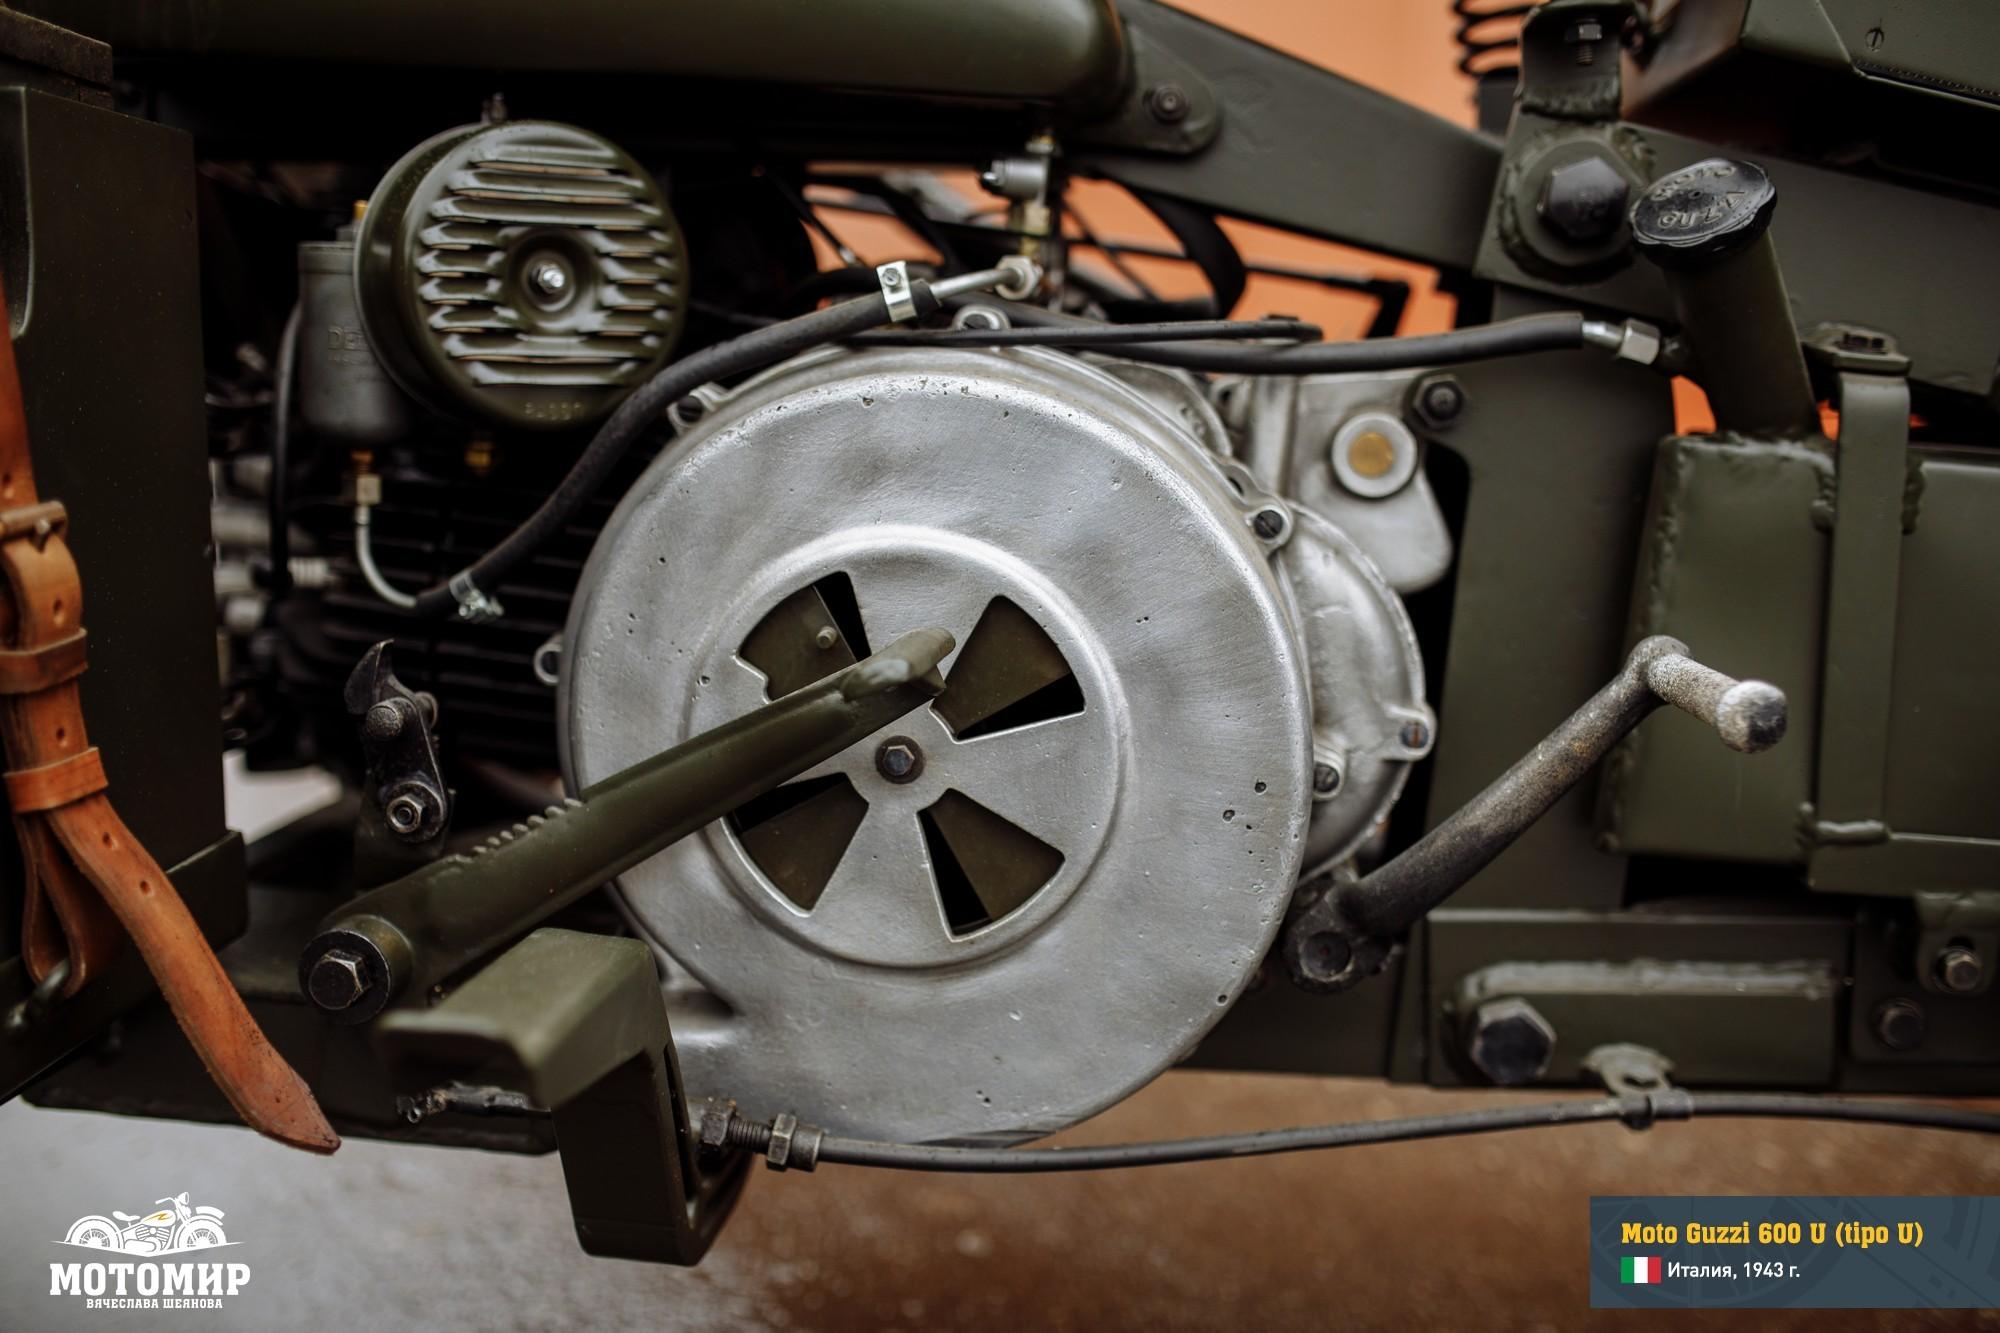 moto-guzzi-600-u-web-50